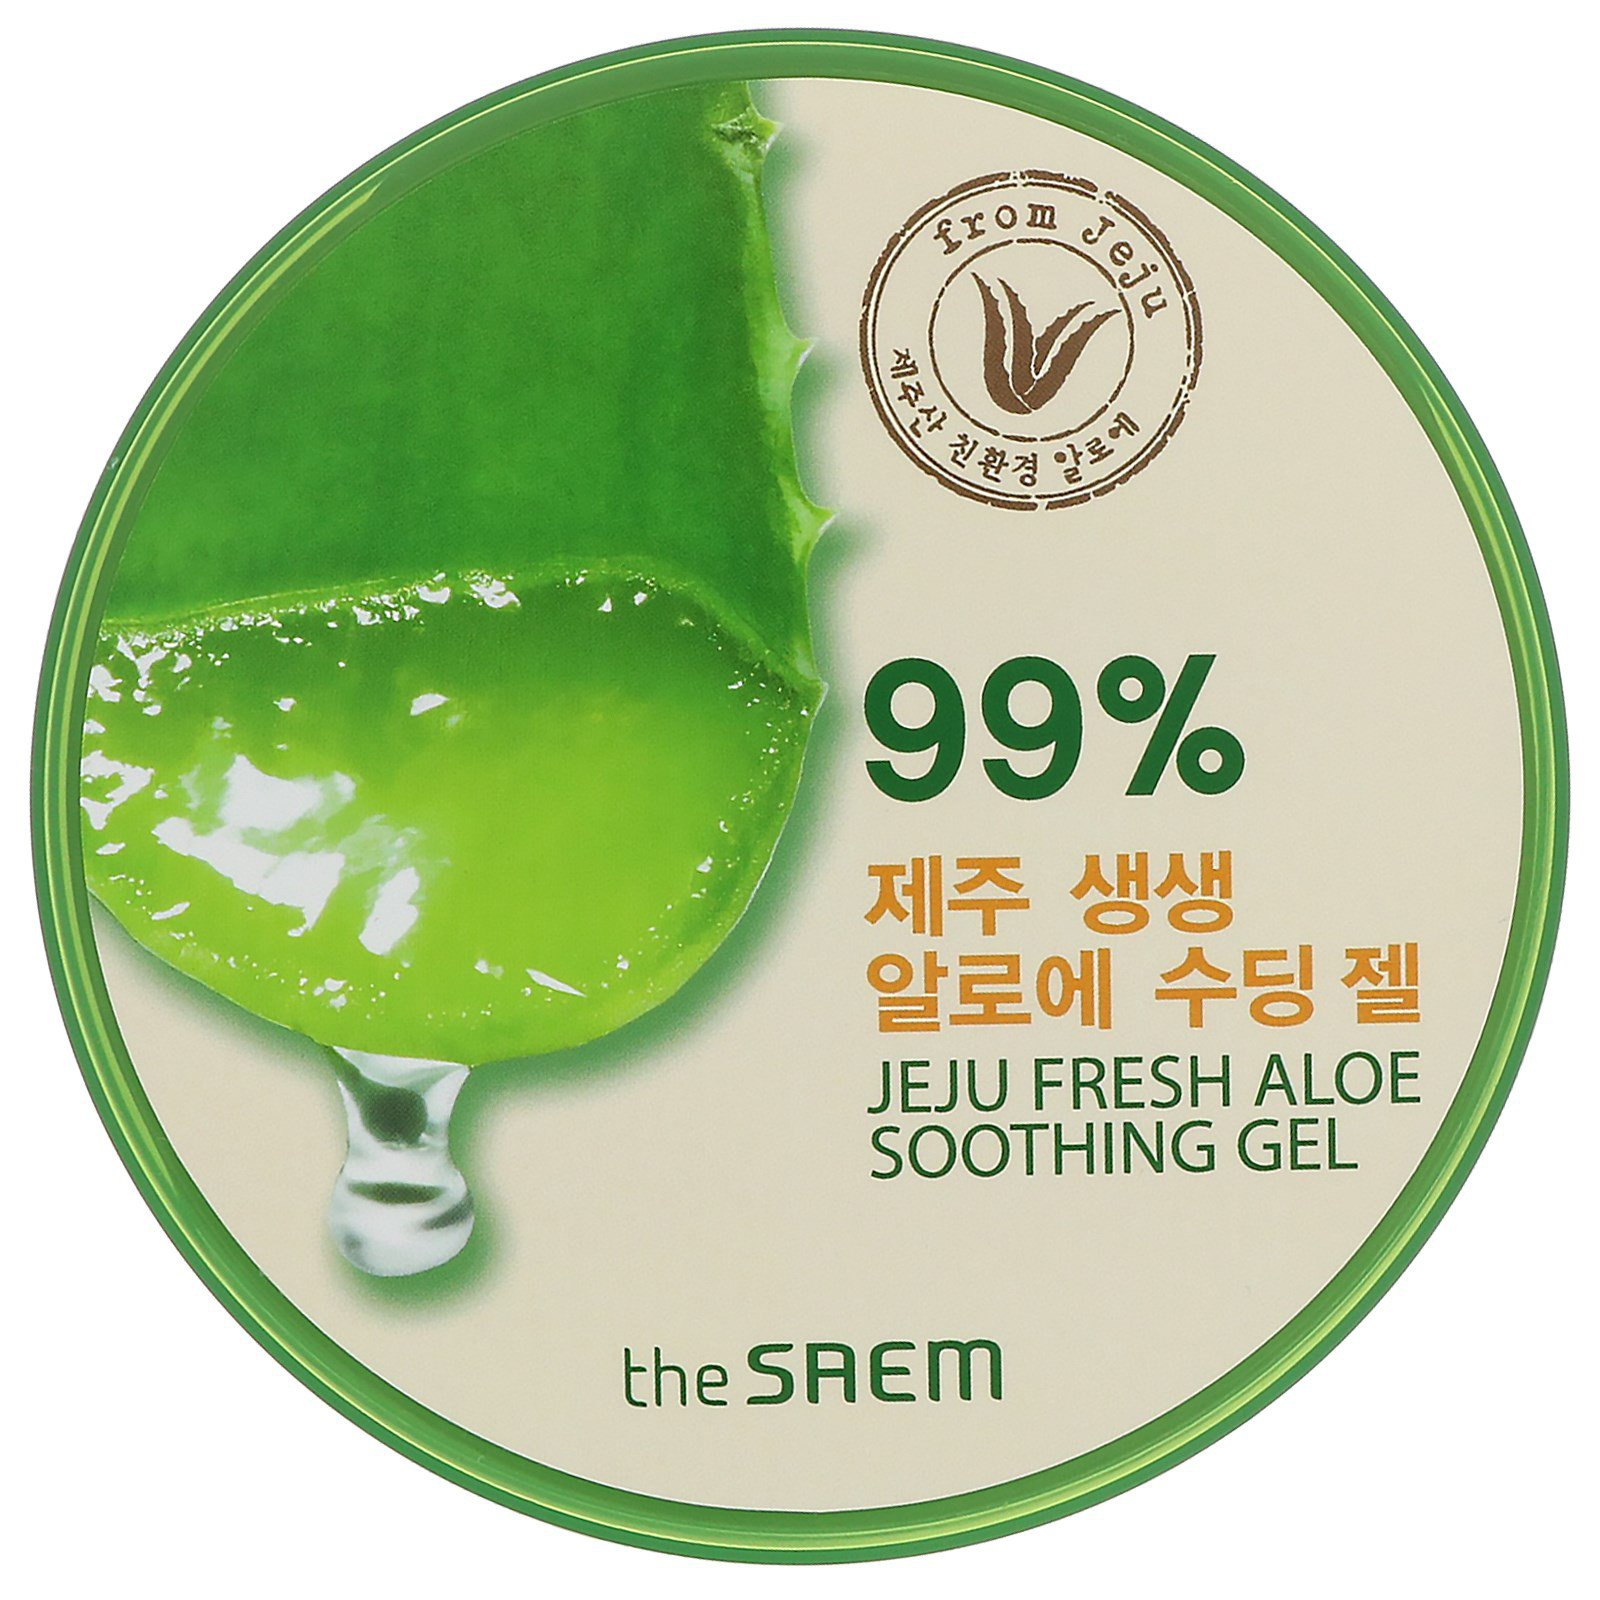 The Saem Jeju Fresh 99% Aloe Soothing Gel